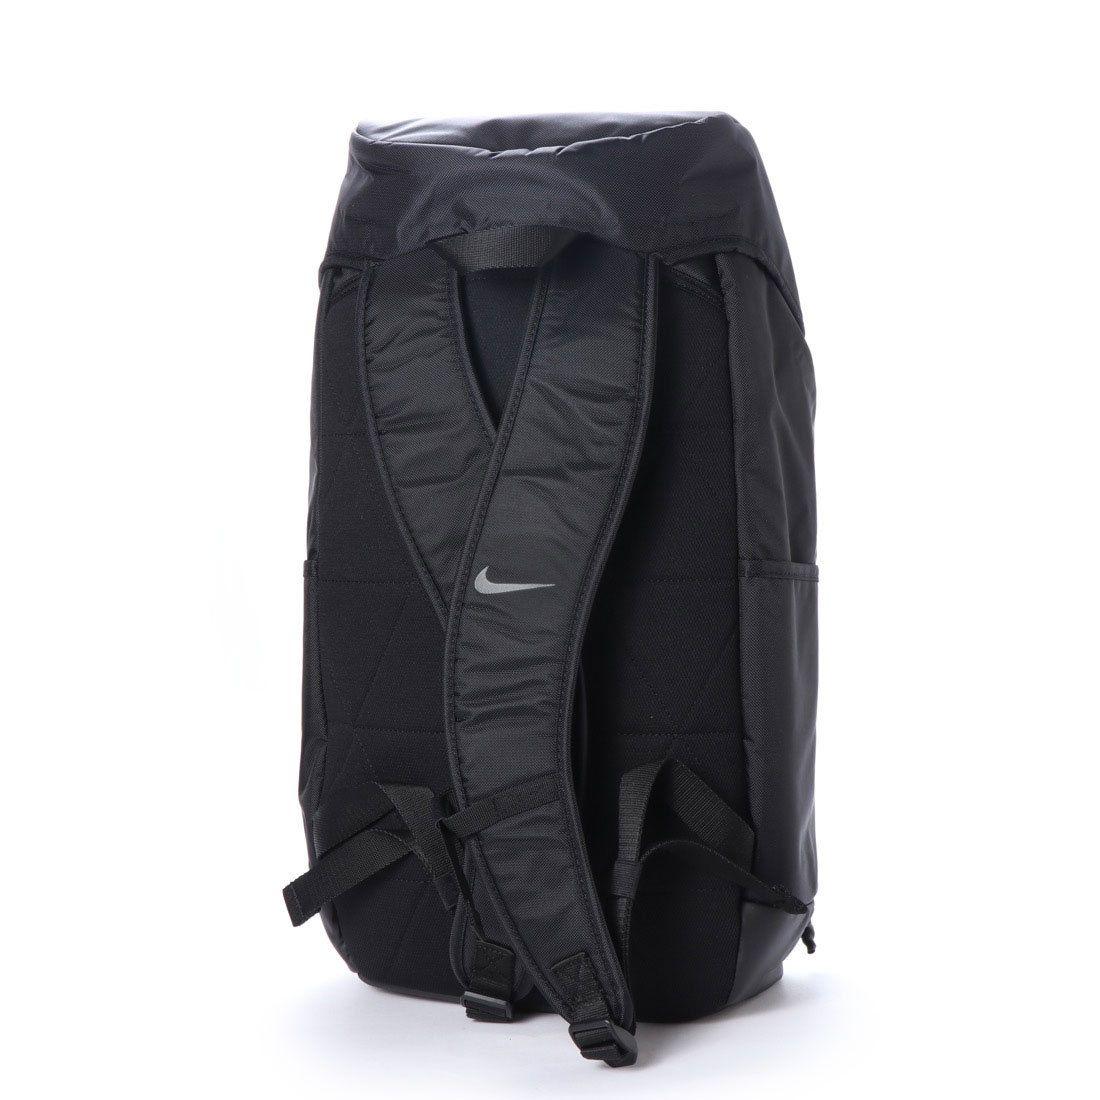 Mochila Nike Vapor Speed 2.0 - Preto